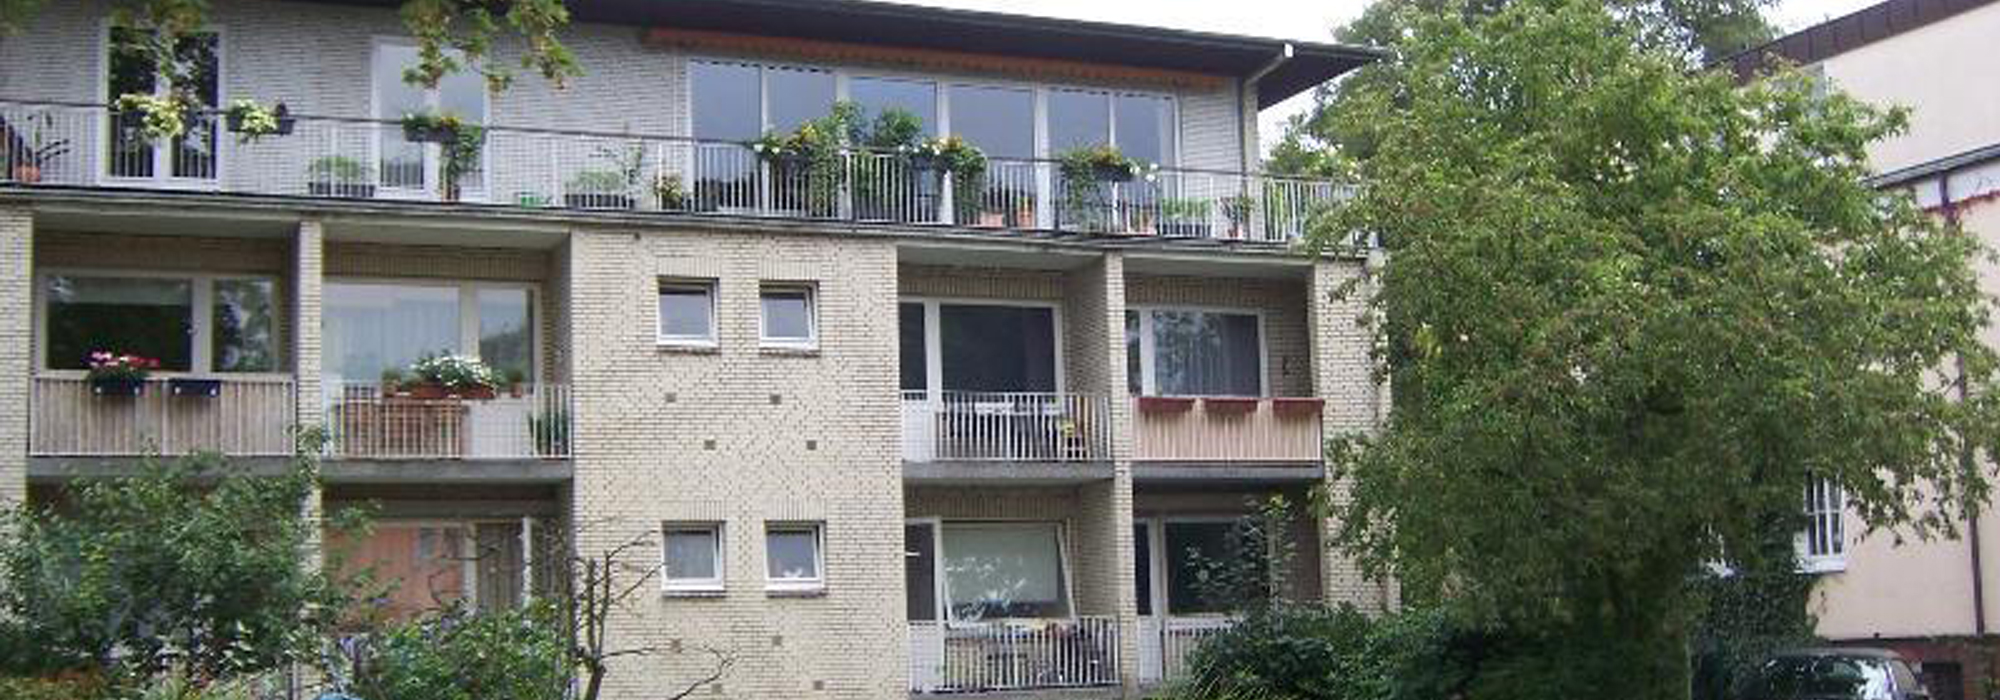 Zinshaus in Marienthal